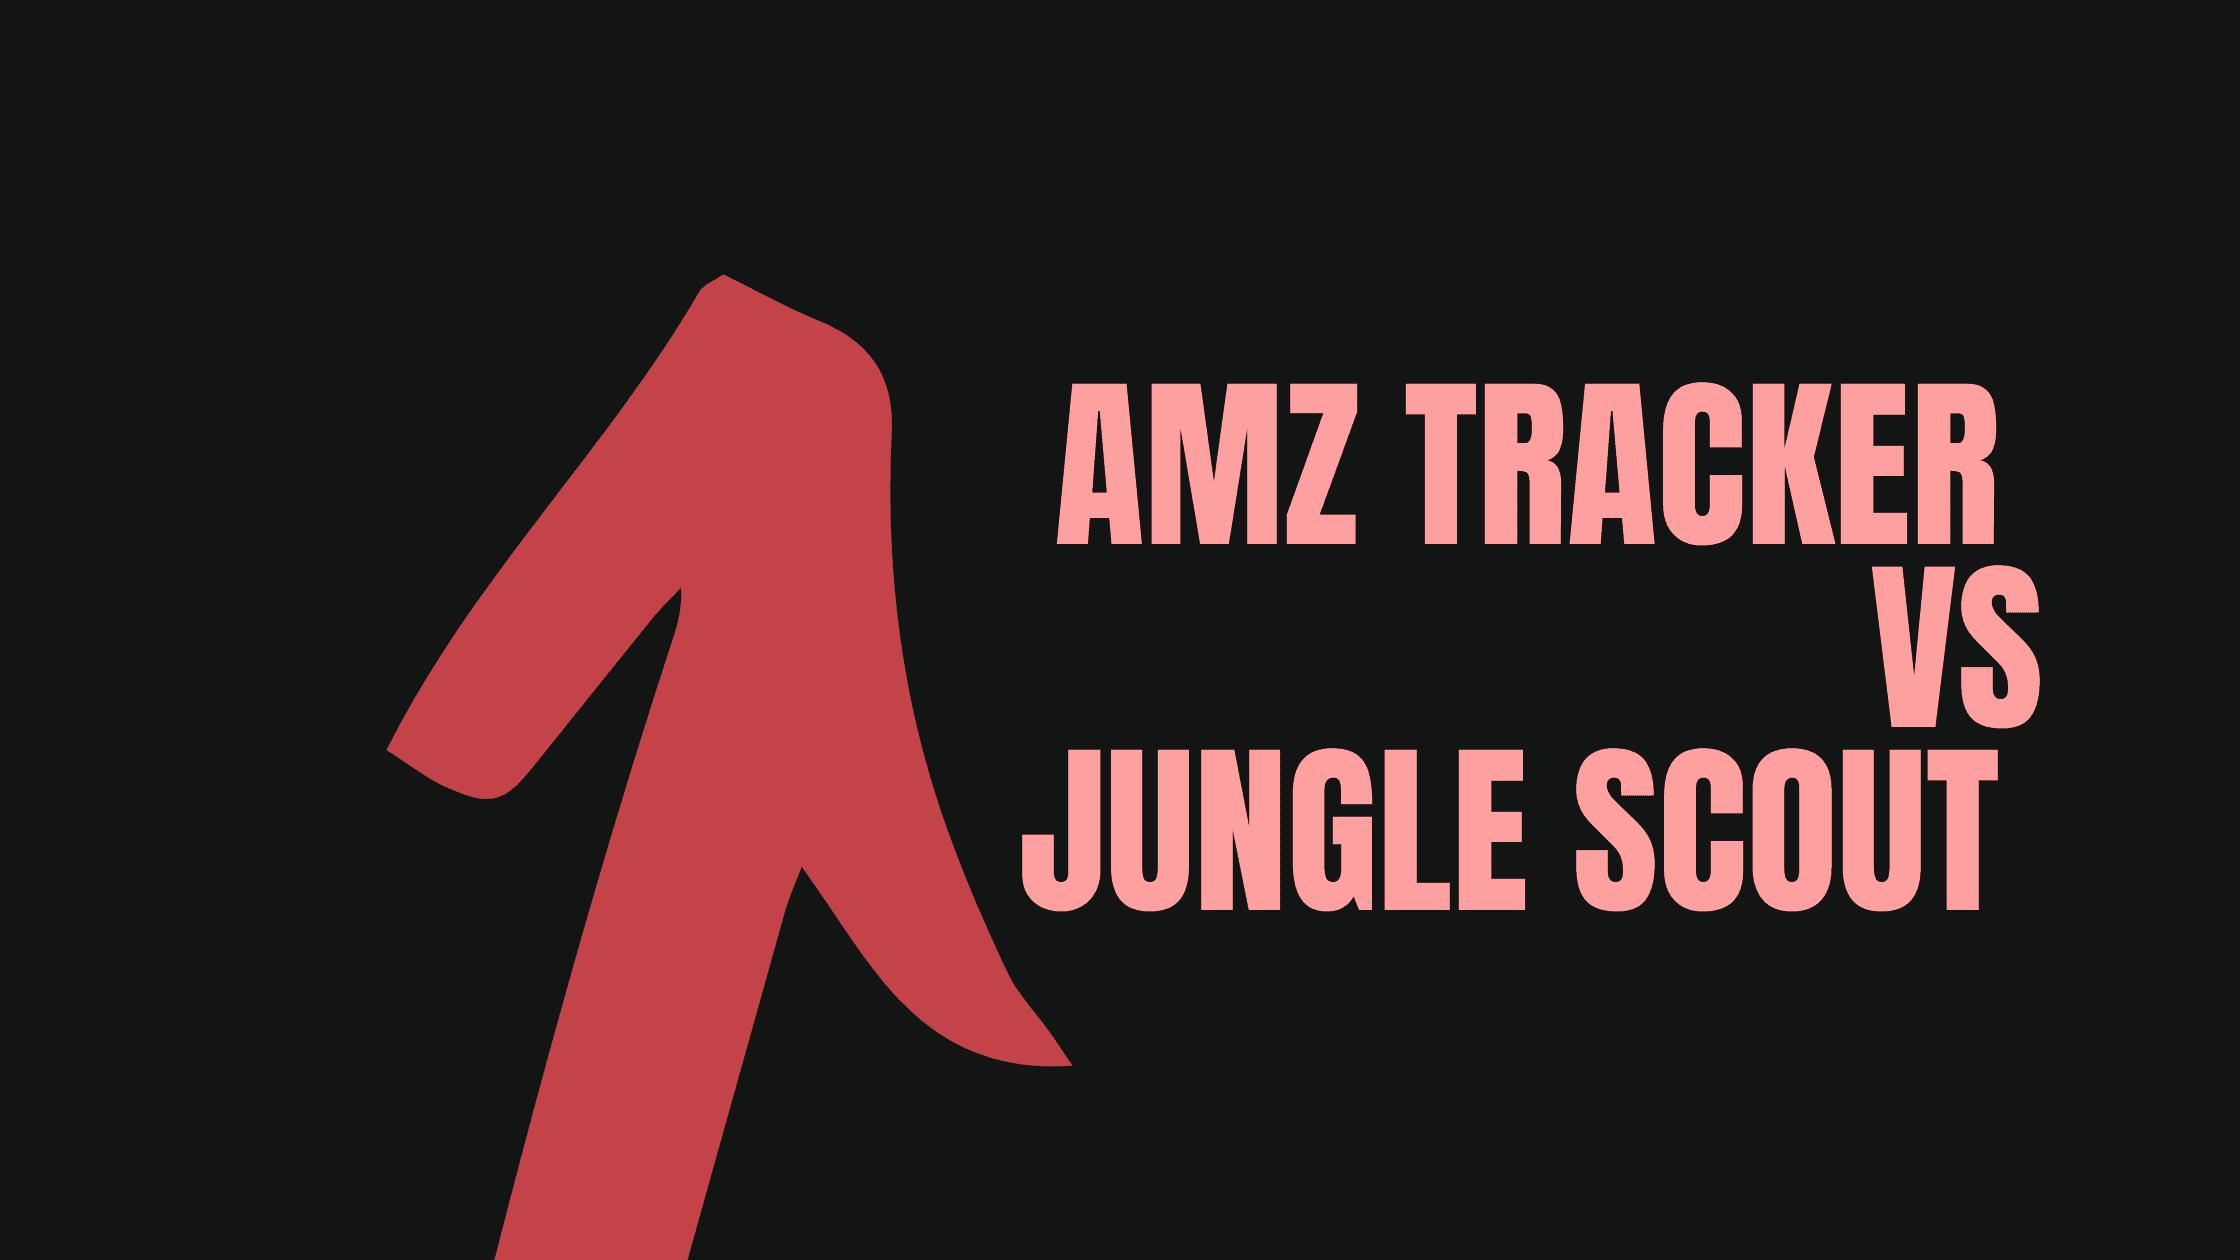 Amz tracker vs Jungle scout